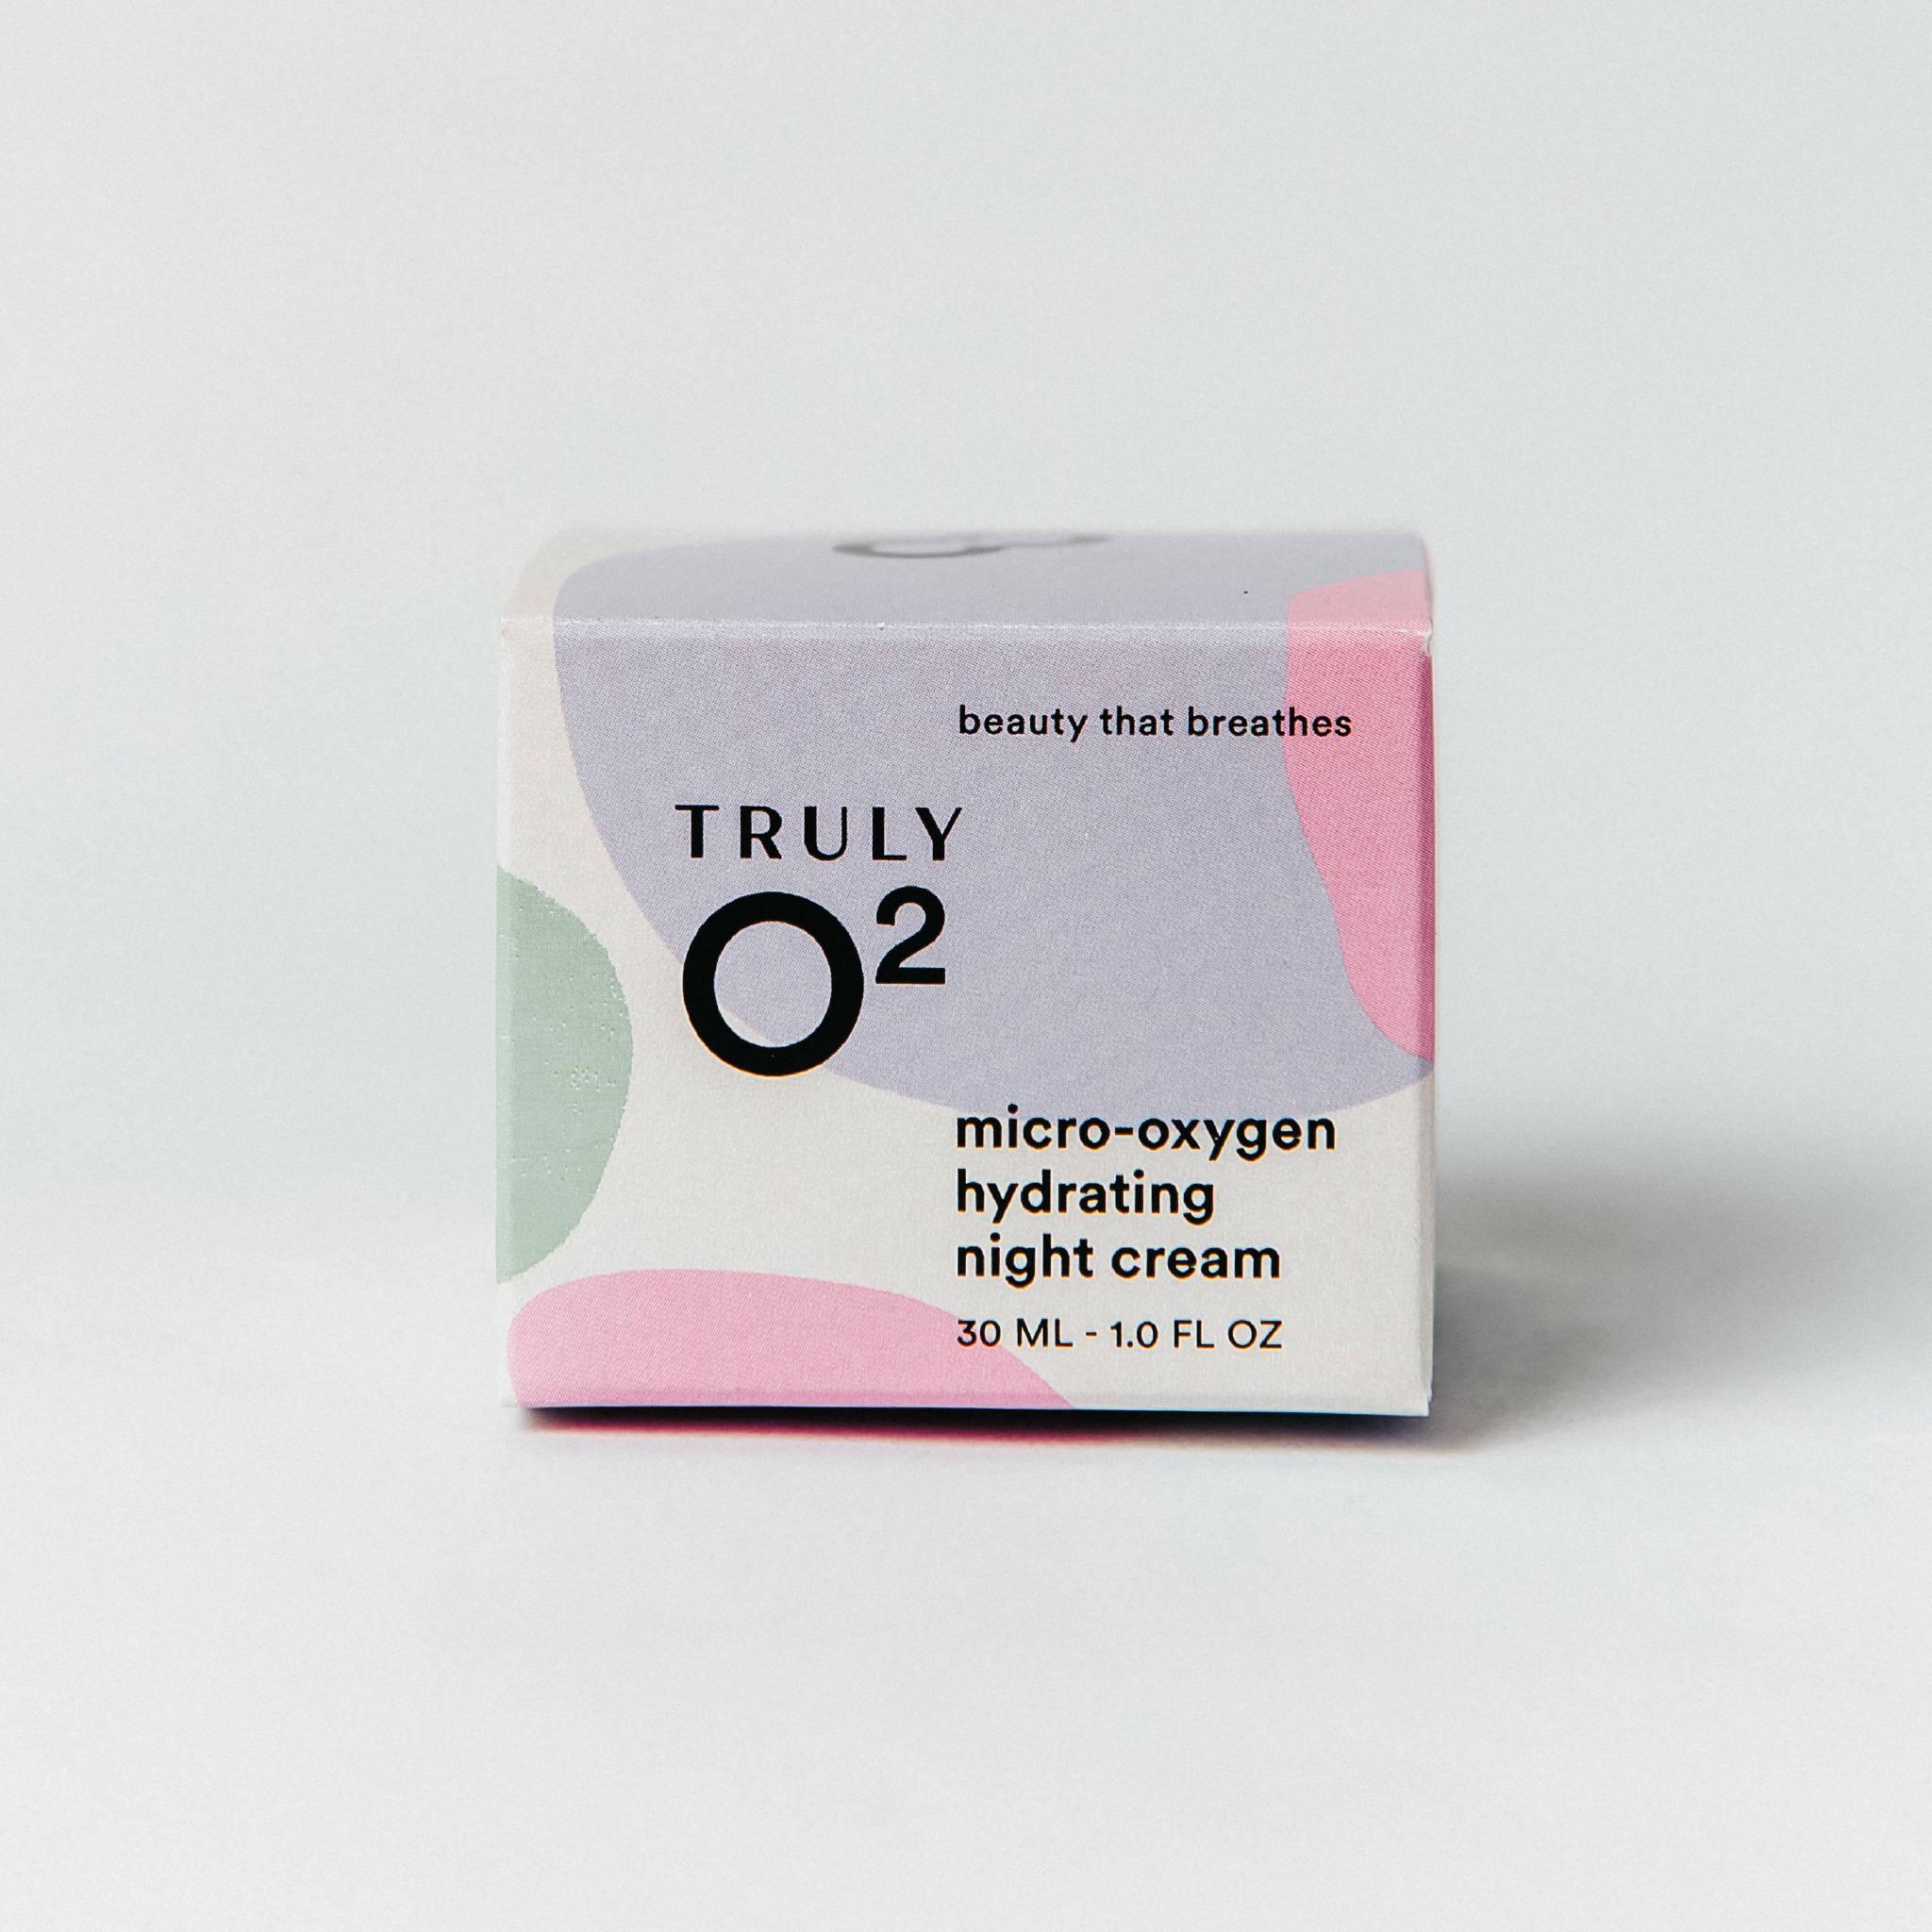 Truly O2 micro-oxygen hydrating night cream 1oz face cream box